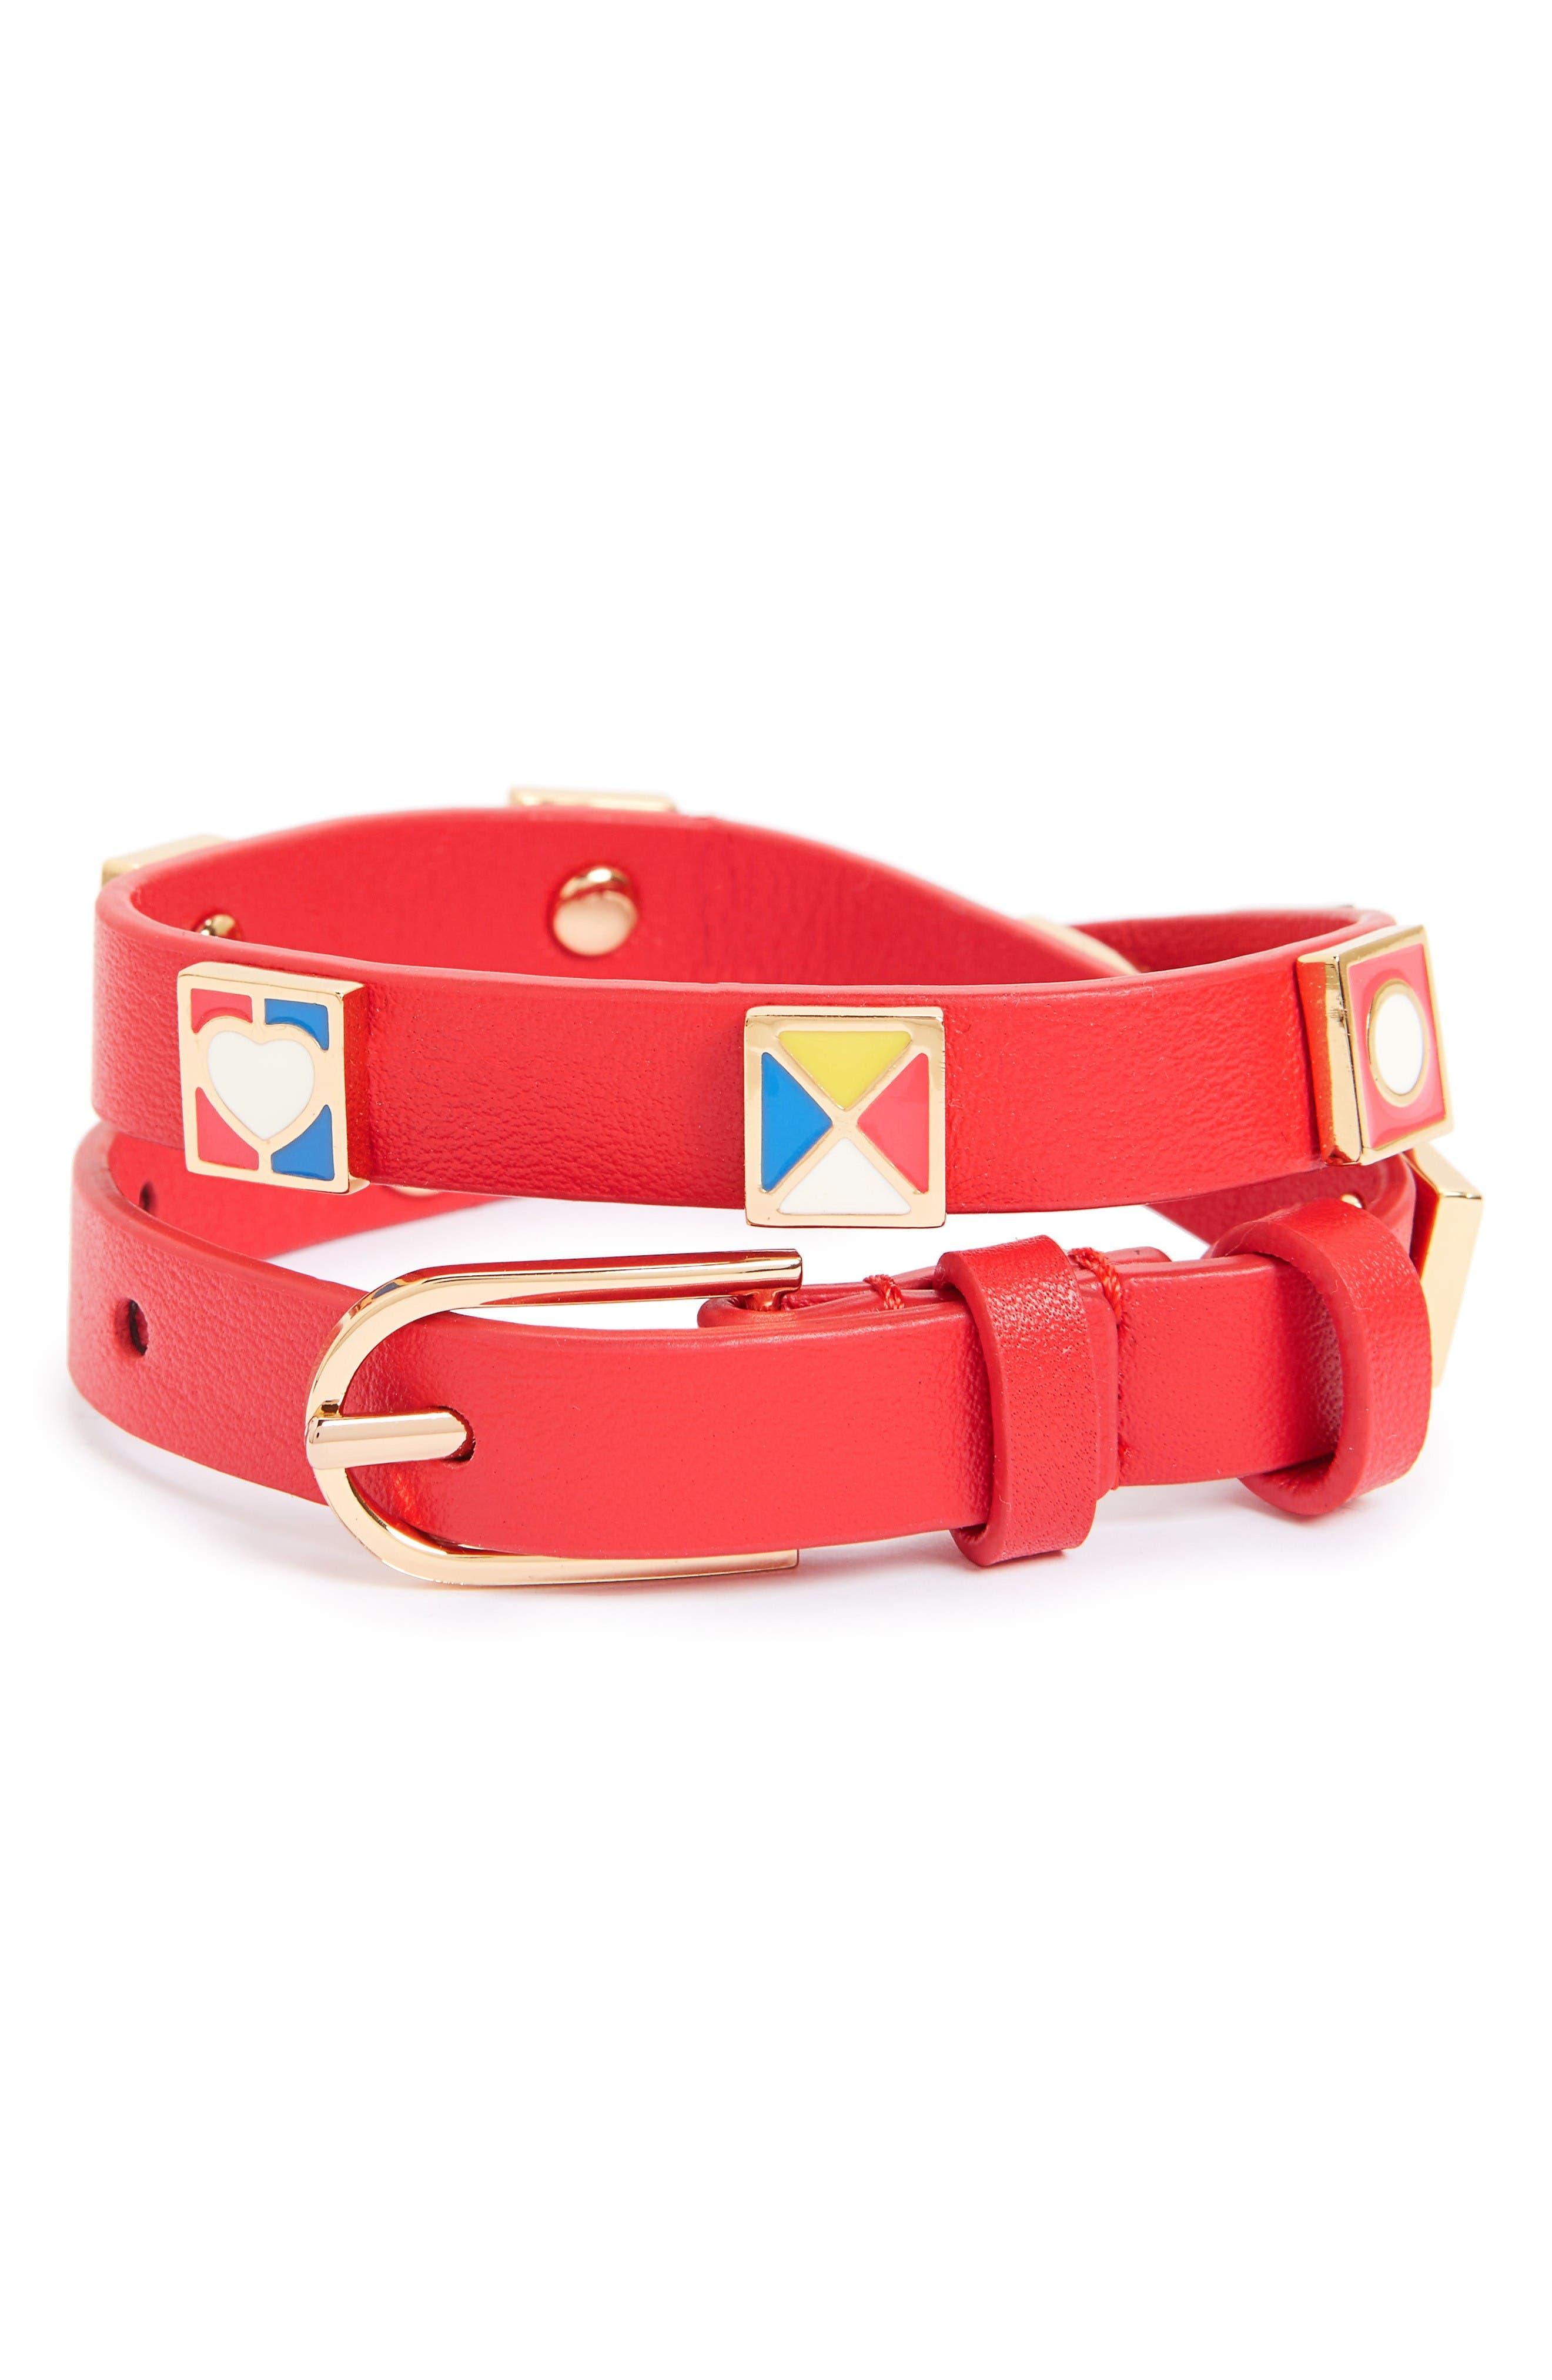 TORY BURCH Flag Leather Wrap Bracelet